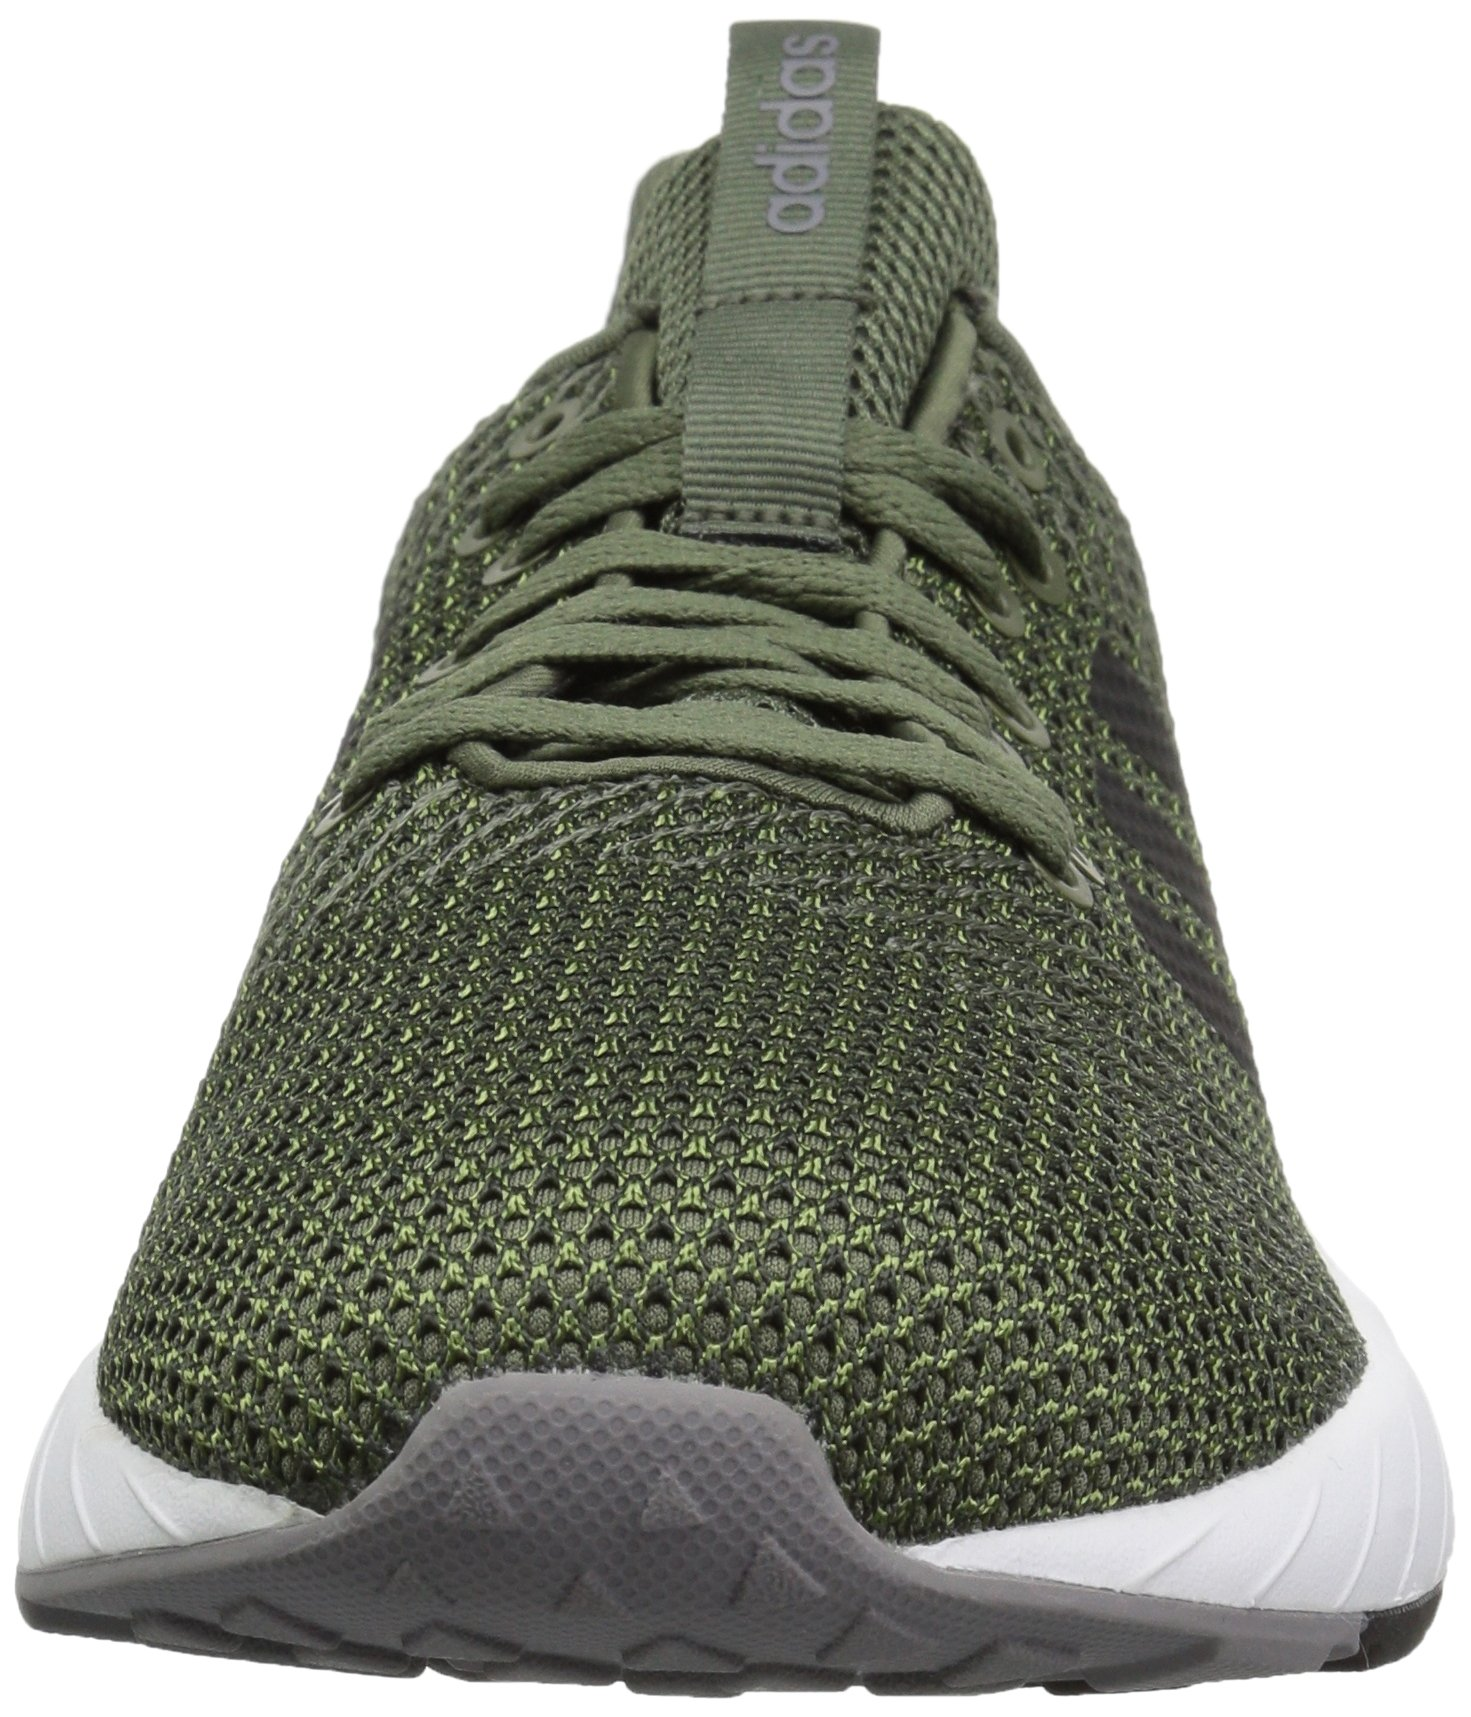 adidas Men's Questar BYD Running Shoe, Base Green/Black/Grey, 6.5 M US by adidas (Image #4)